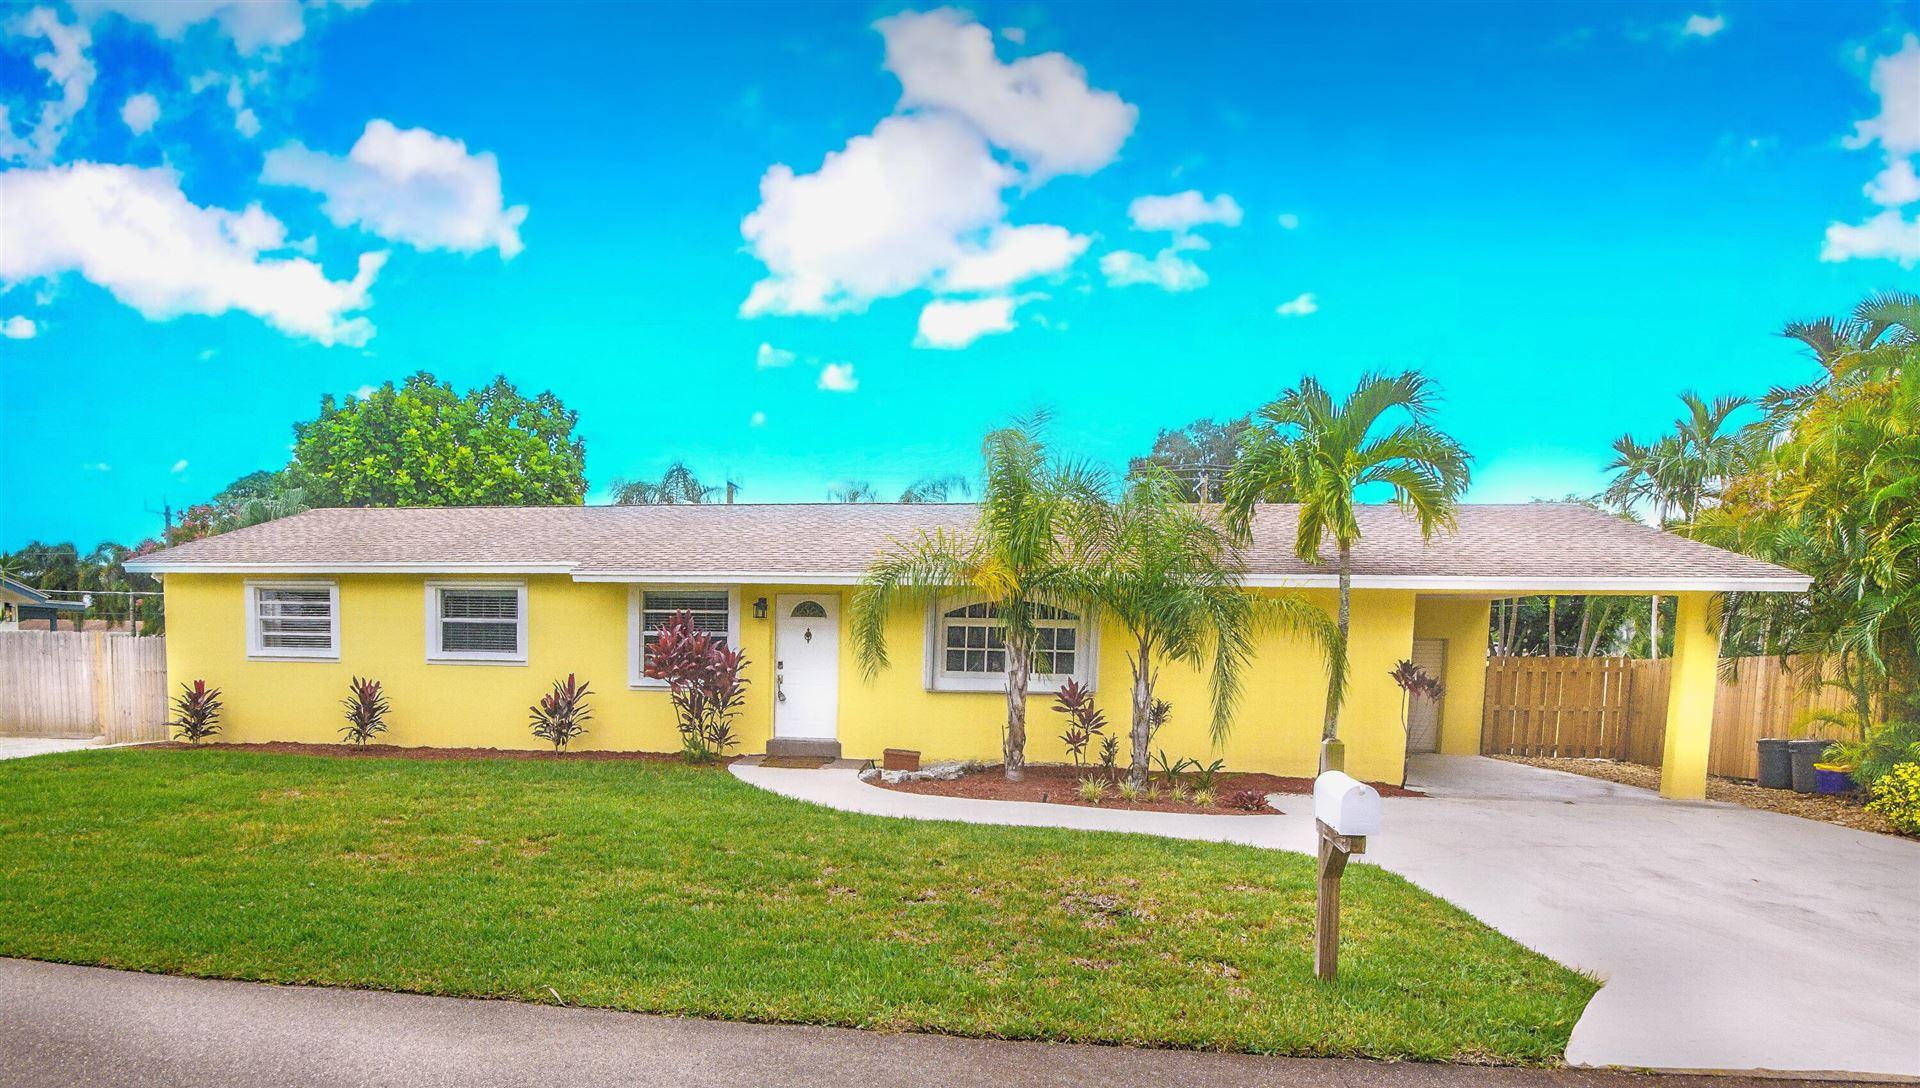 Photo for 212 River Terrace Drive, Jupiter, FL 33469 (MLS # RX-10750887)